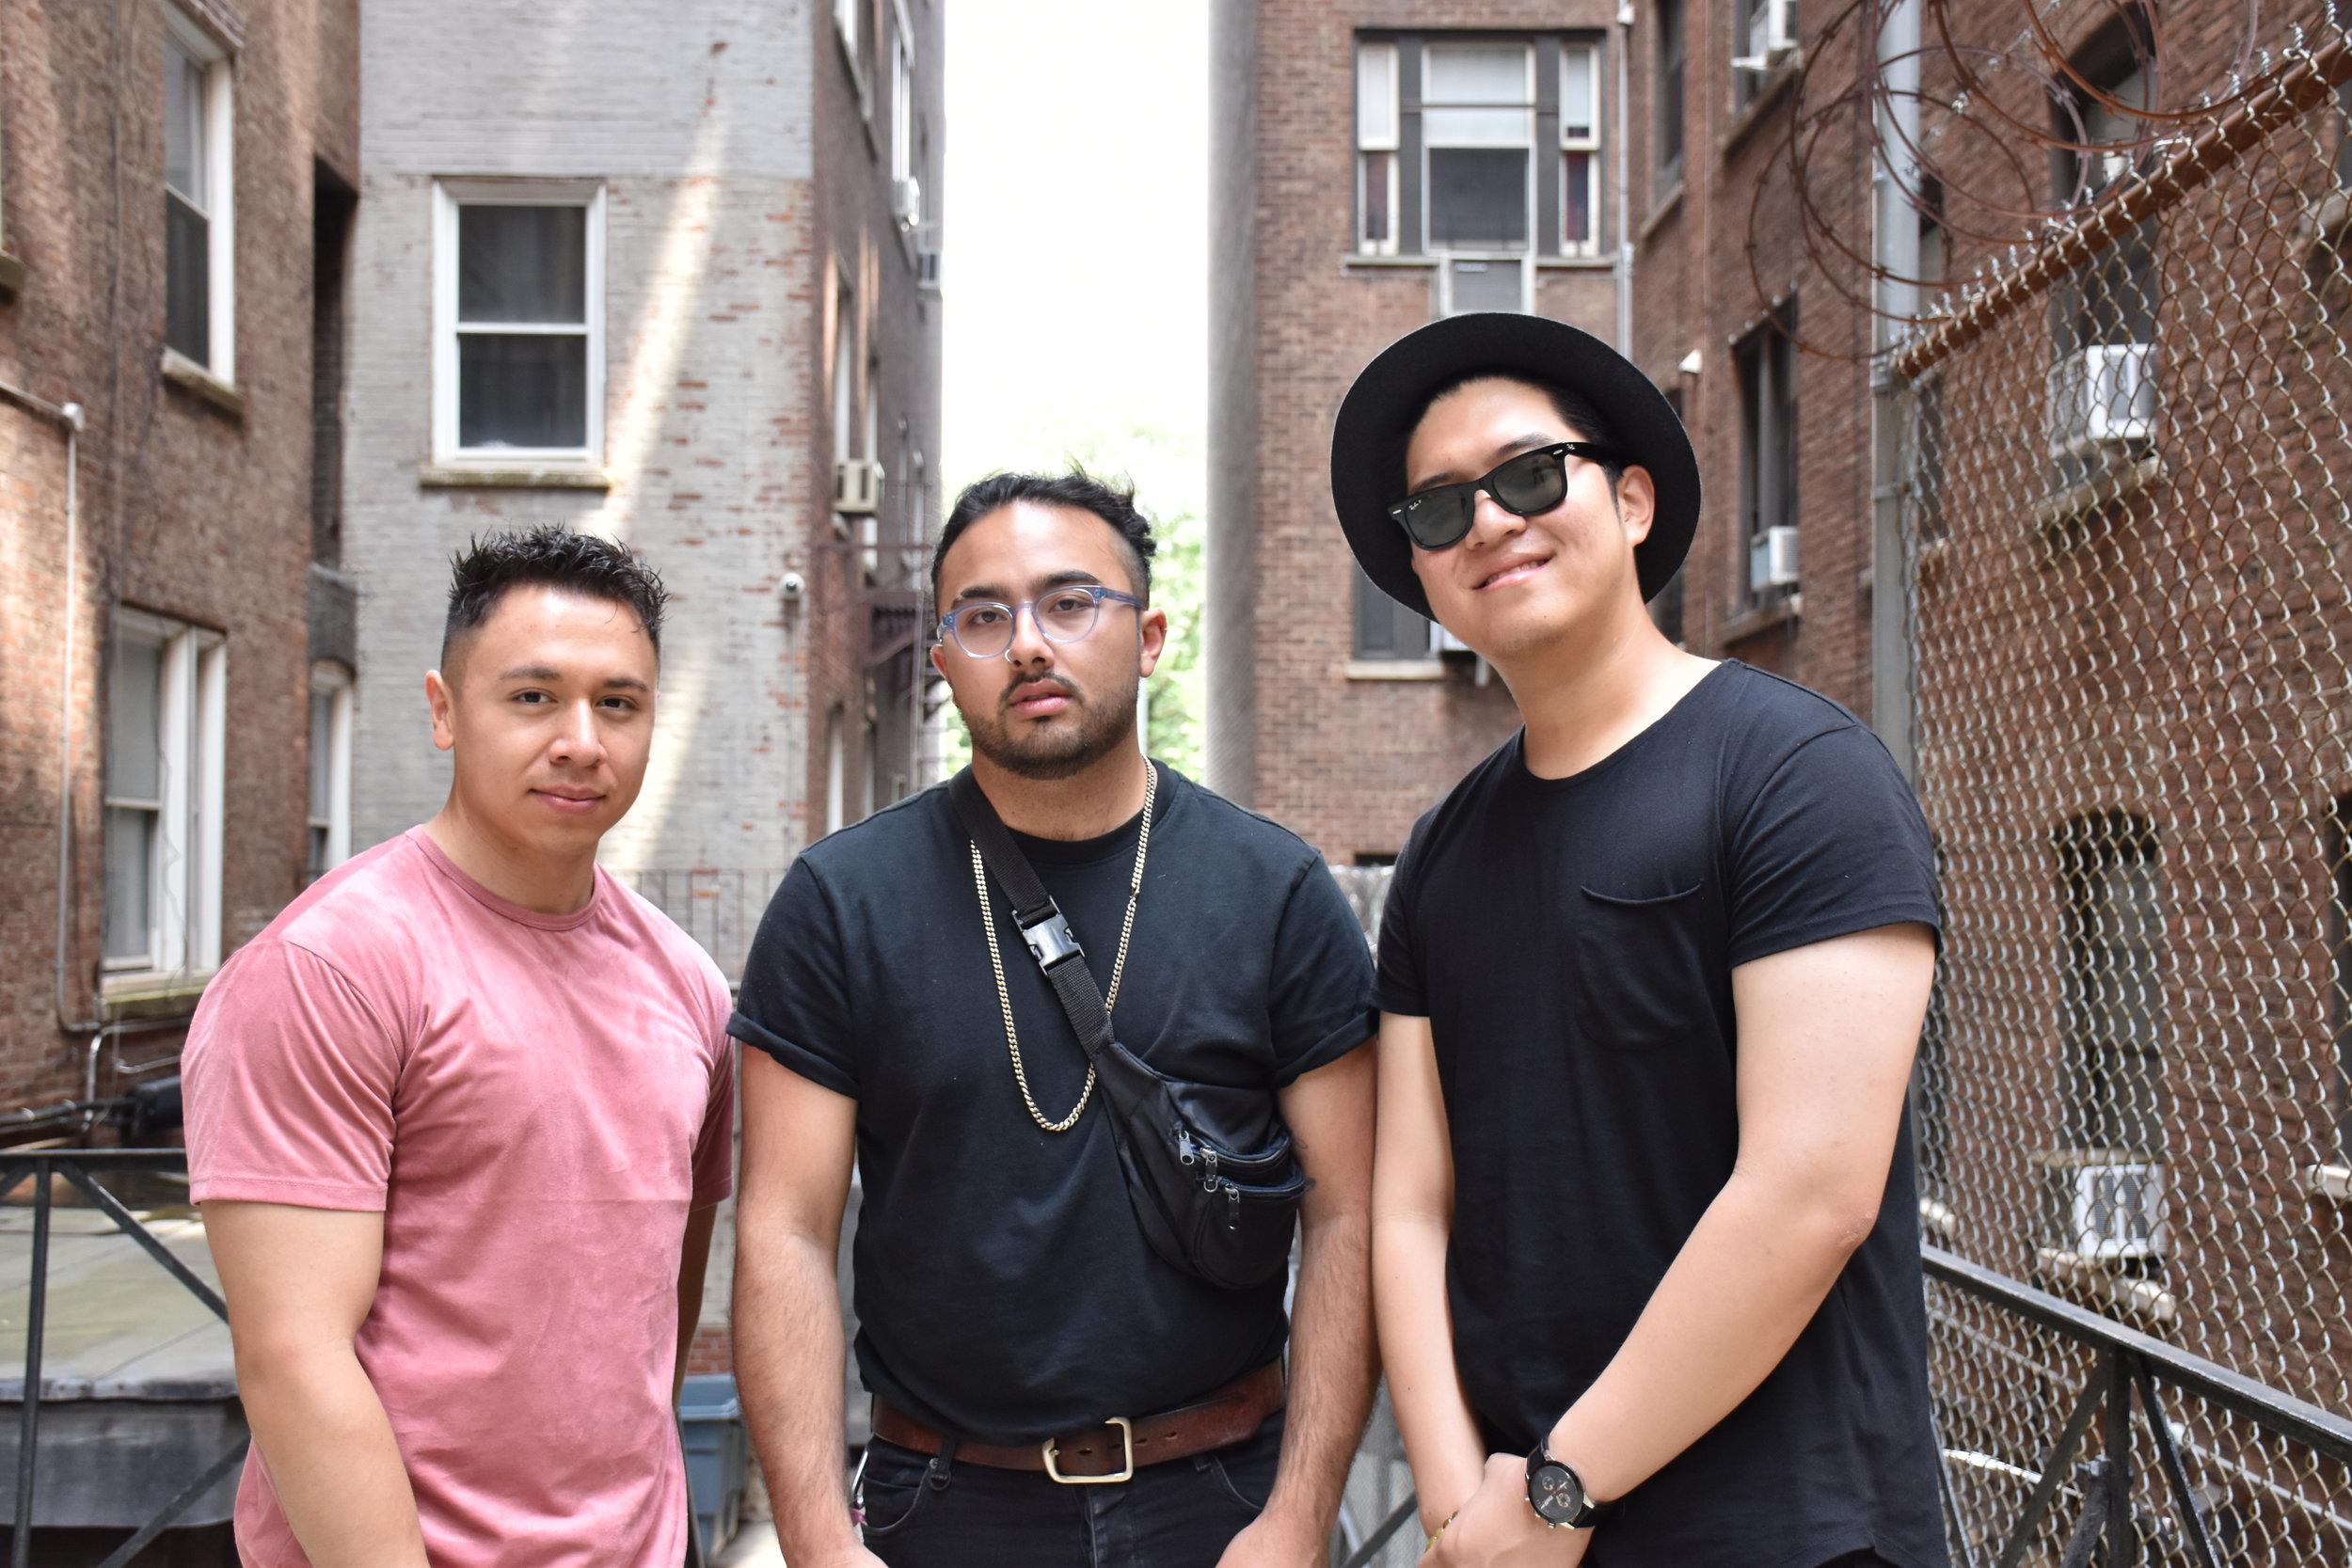 From left: Ruben Mejia, Peter Enriquez, and Paul JuBong Lee. Photo by Vivian Wang.